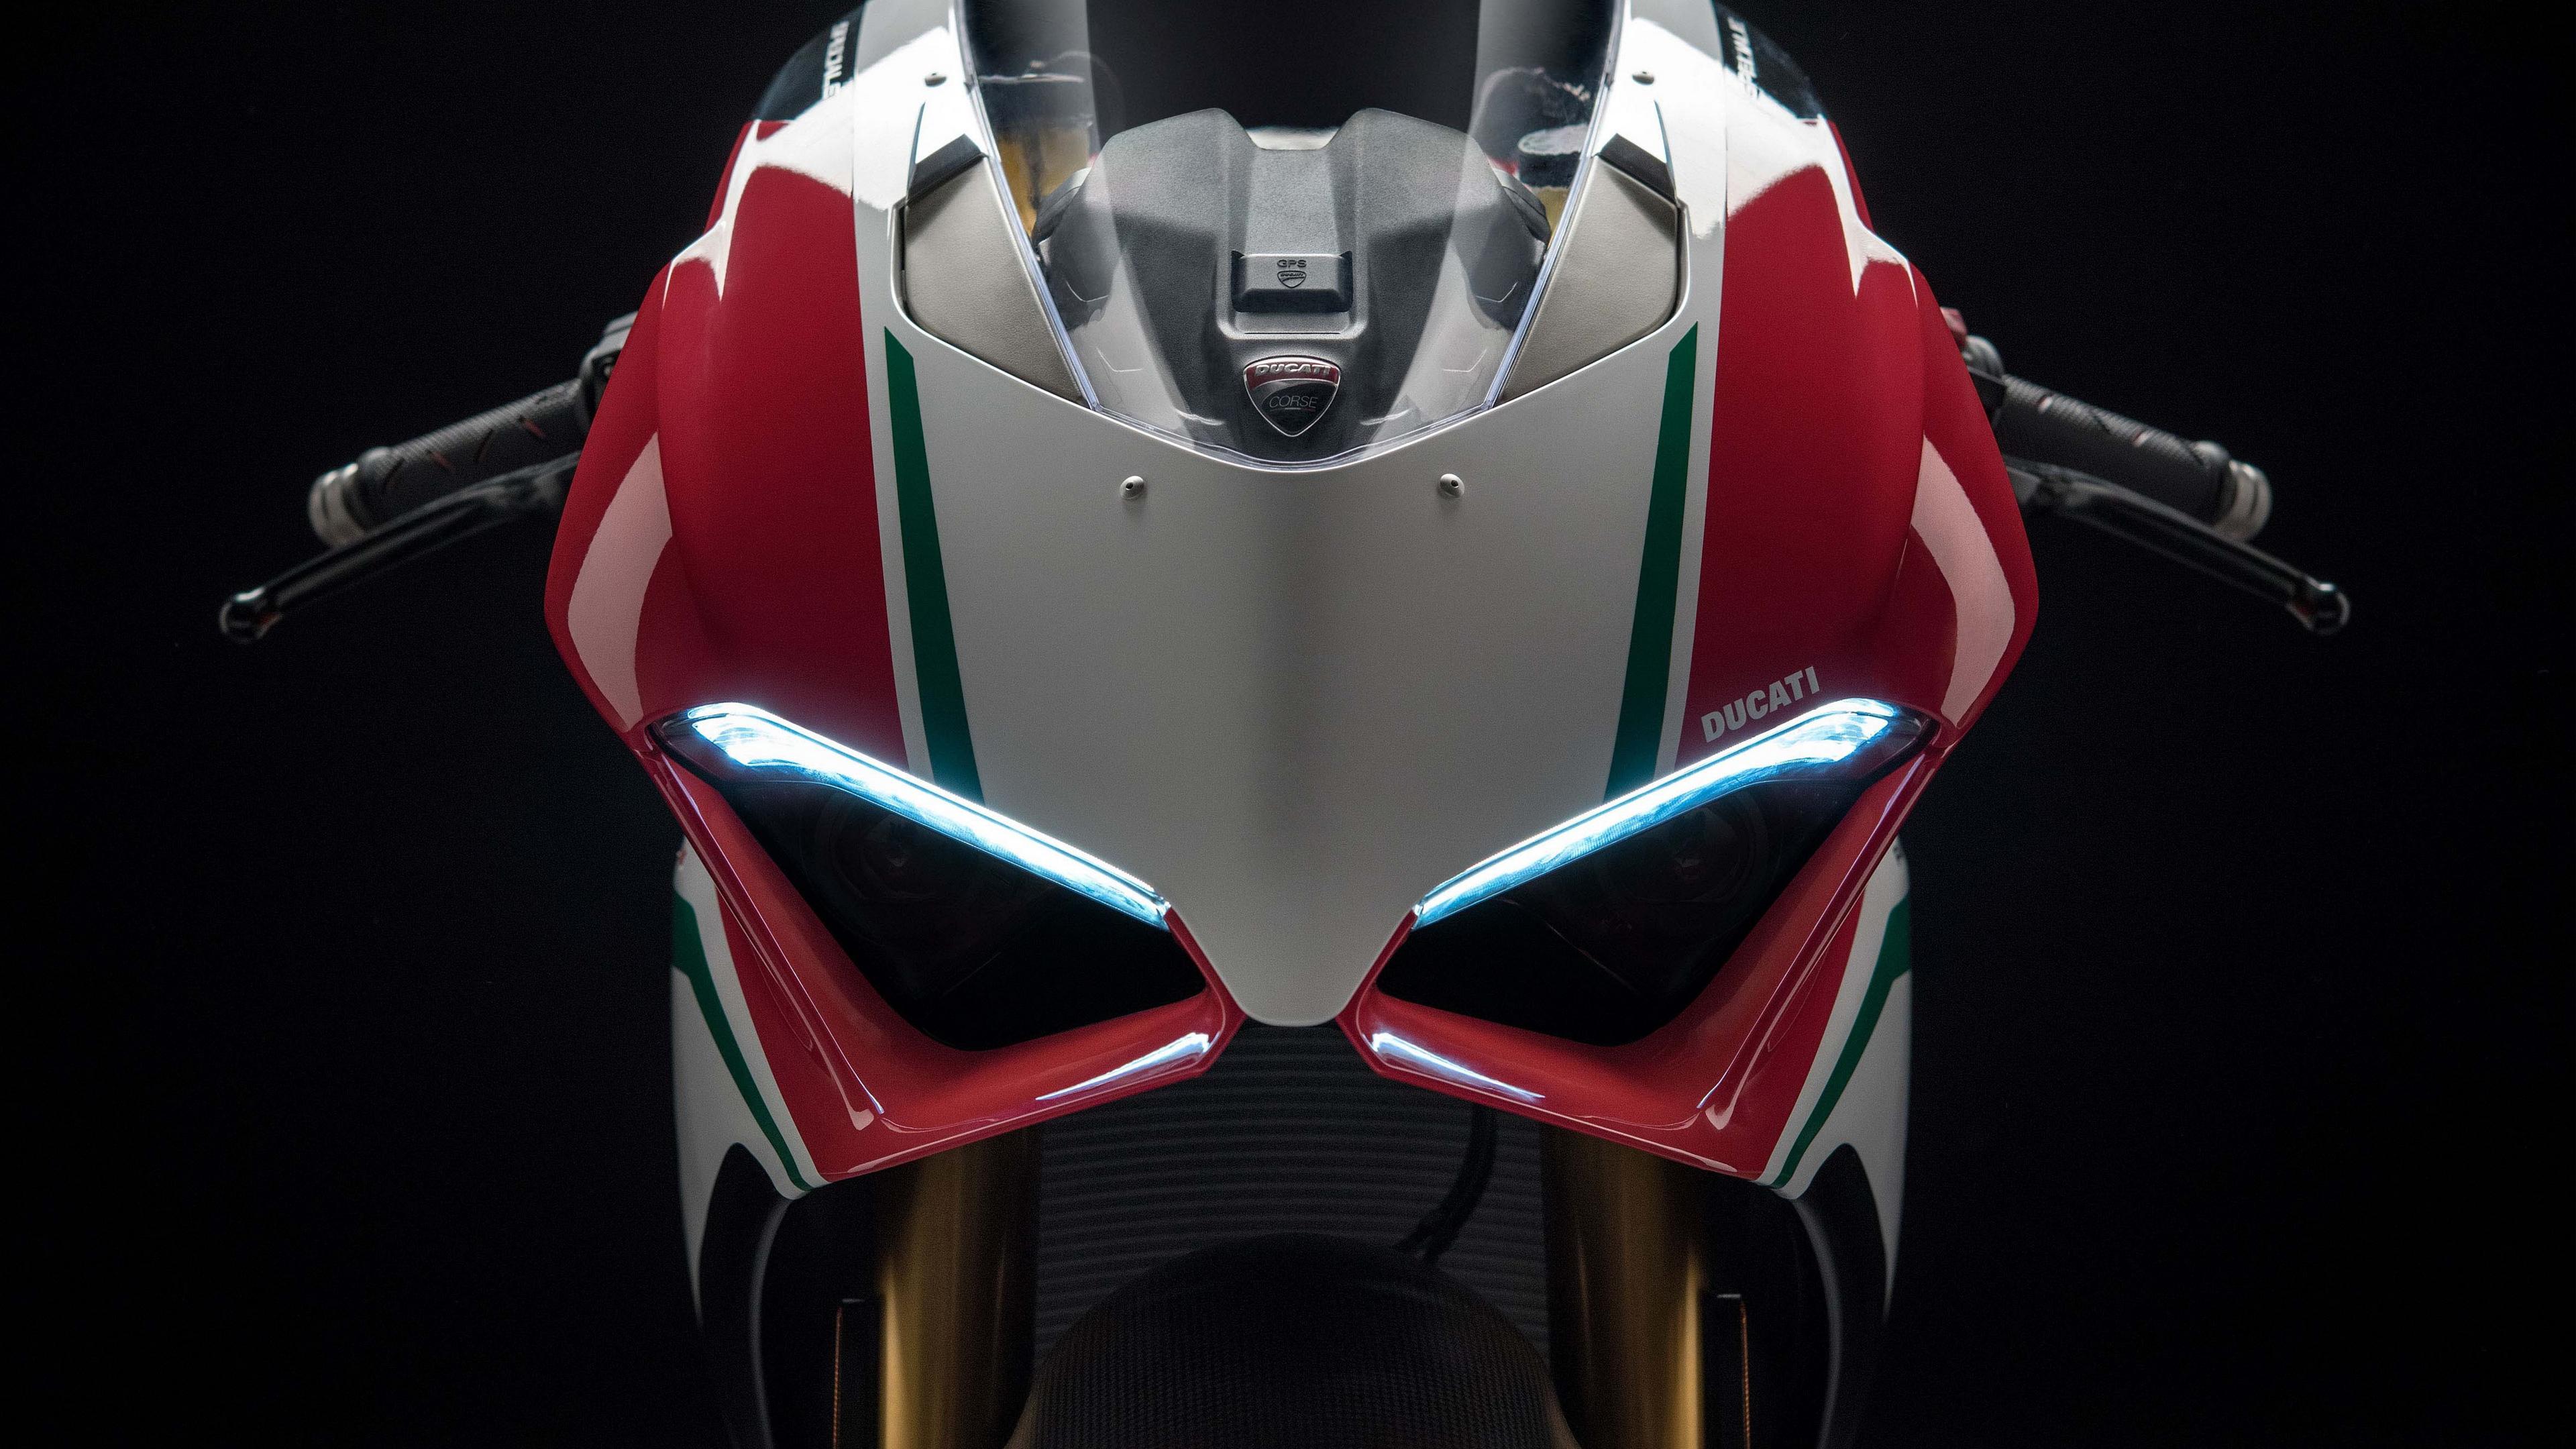 3840x2160 wallpaper 2018 Ducati Panigale V4, superbike, 4k